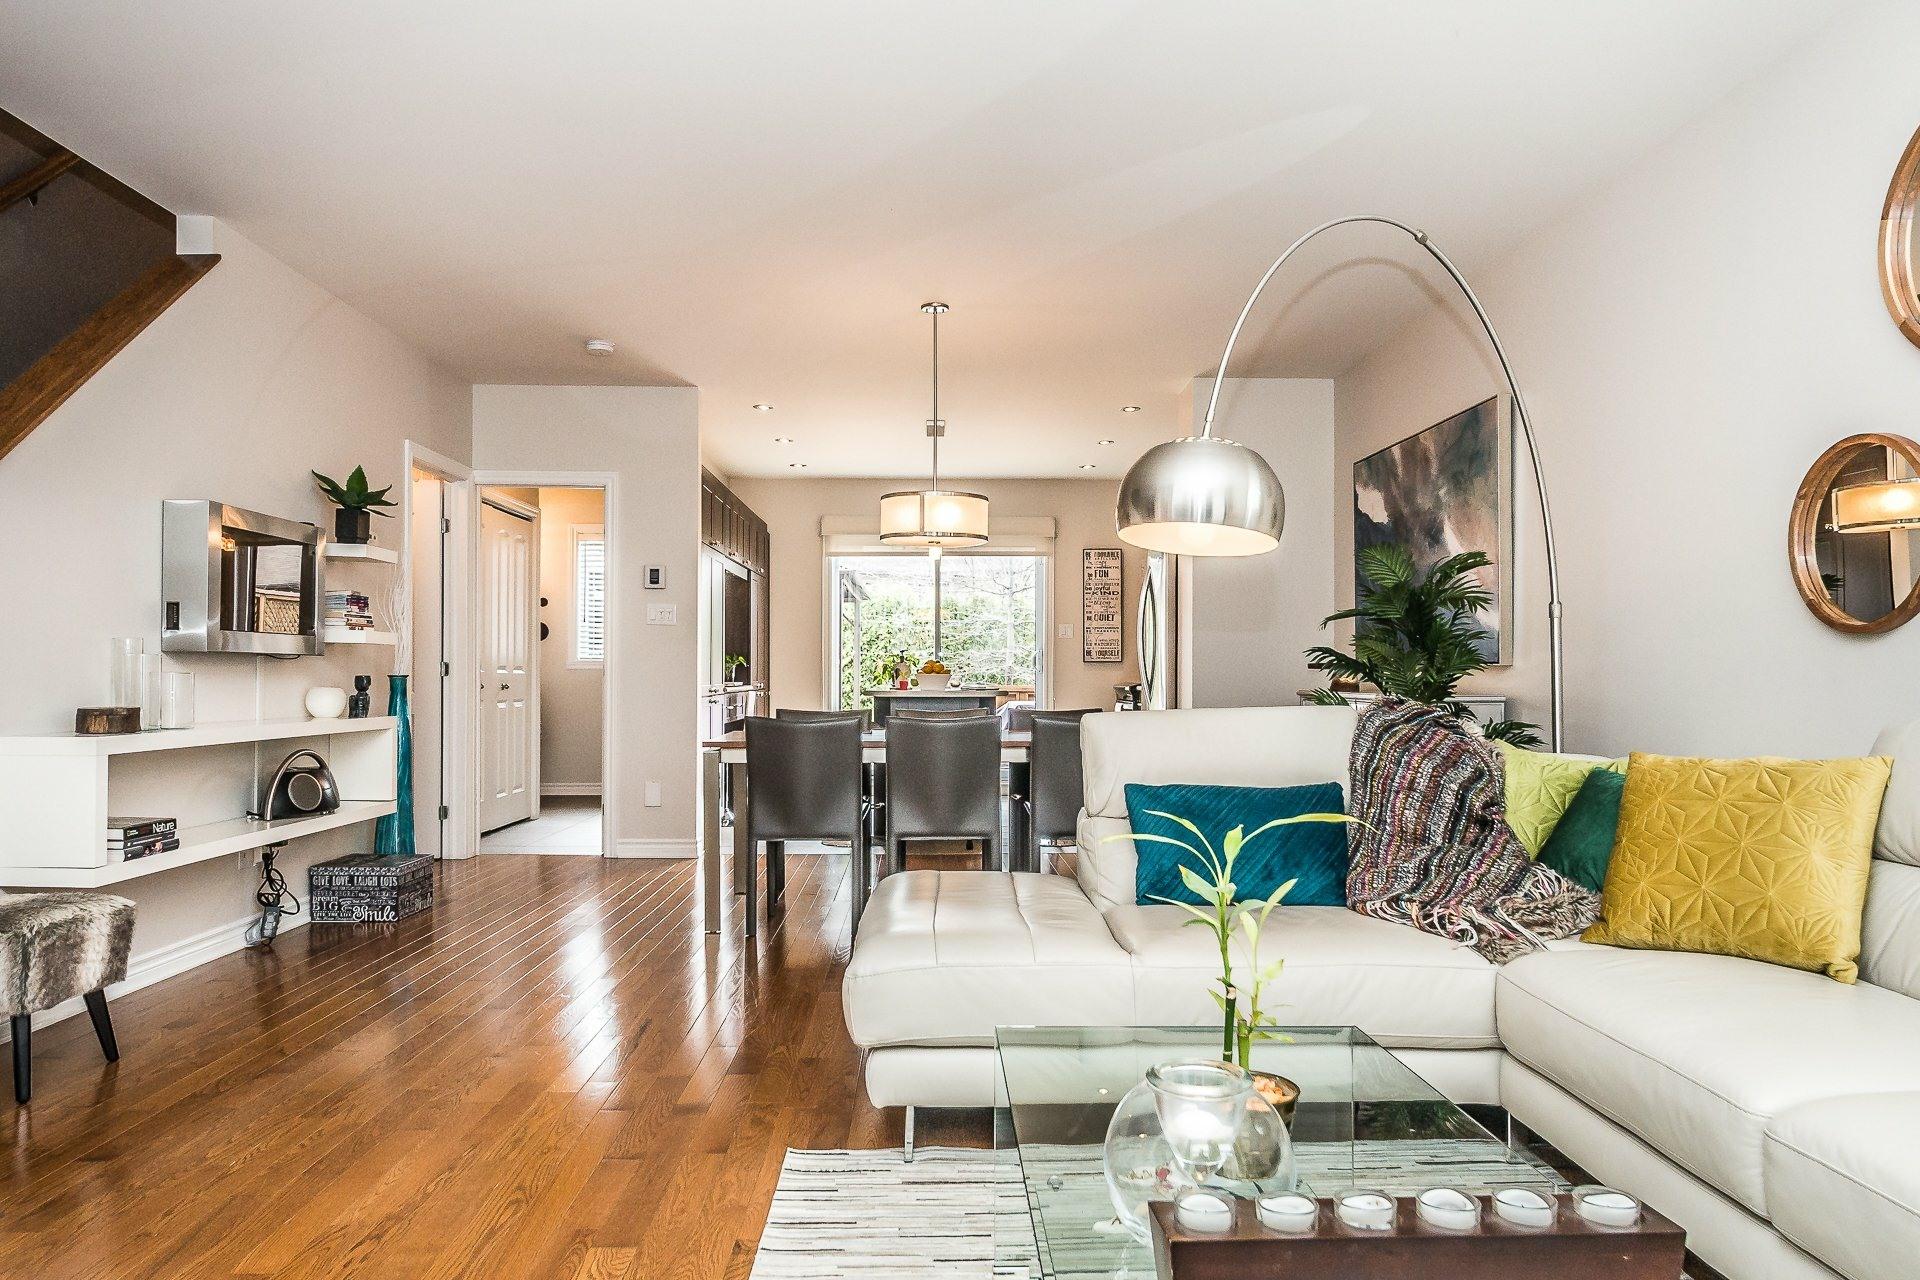 image 3 - MX - Casa sola - MX En venta Montréal Lachine  - 8 habitaciones